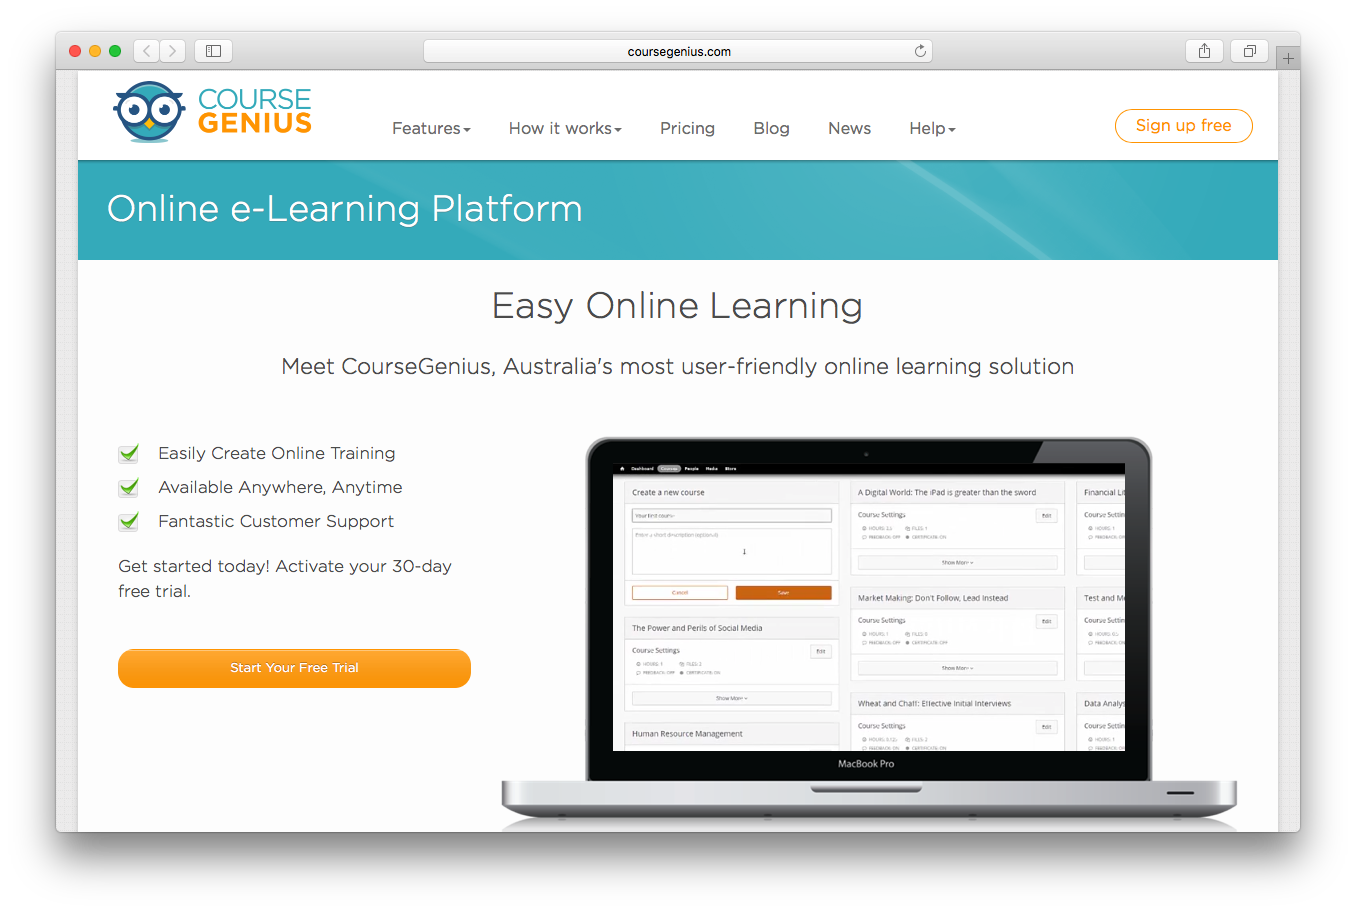 CourseGenius online e-learning platform user friendly